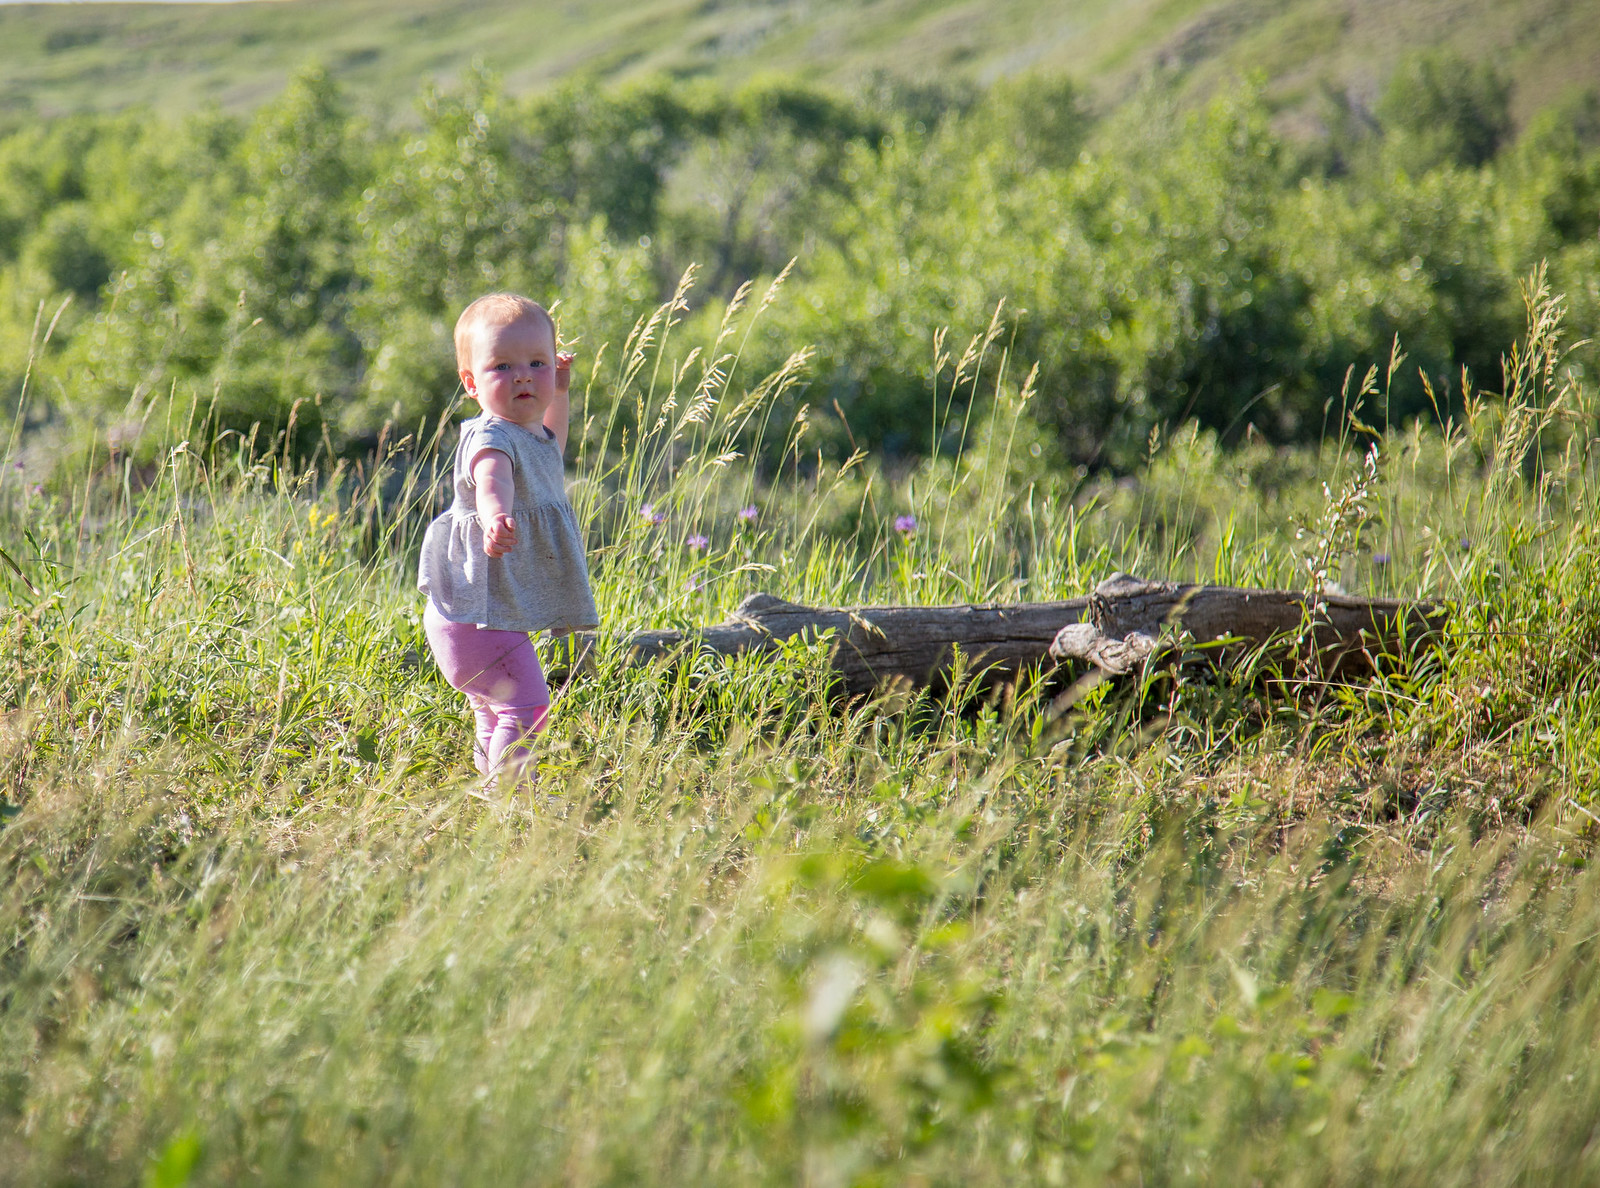 2015-07-03 Oviatt Farm-0044.jpg